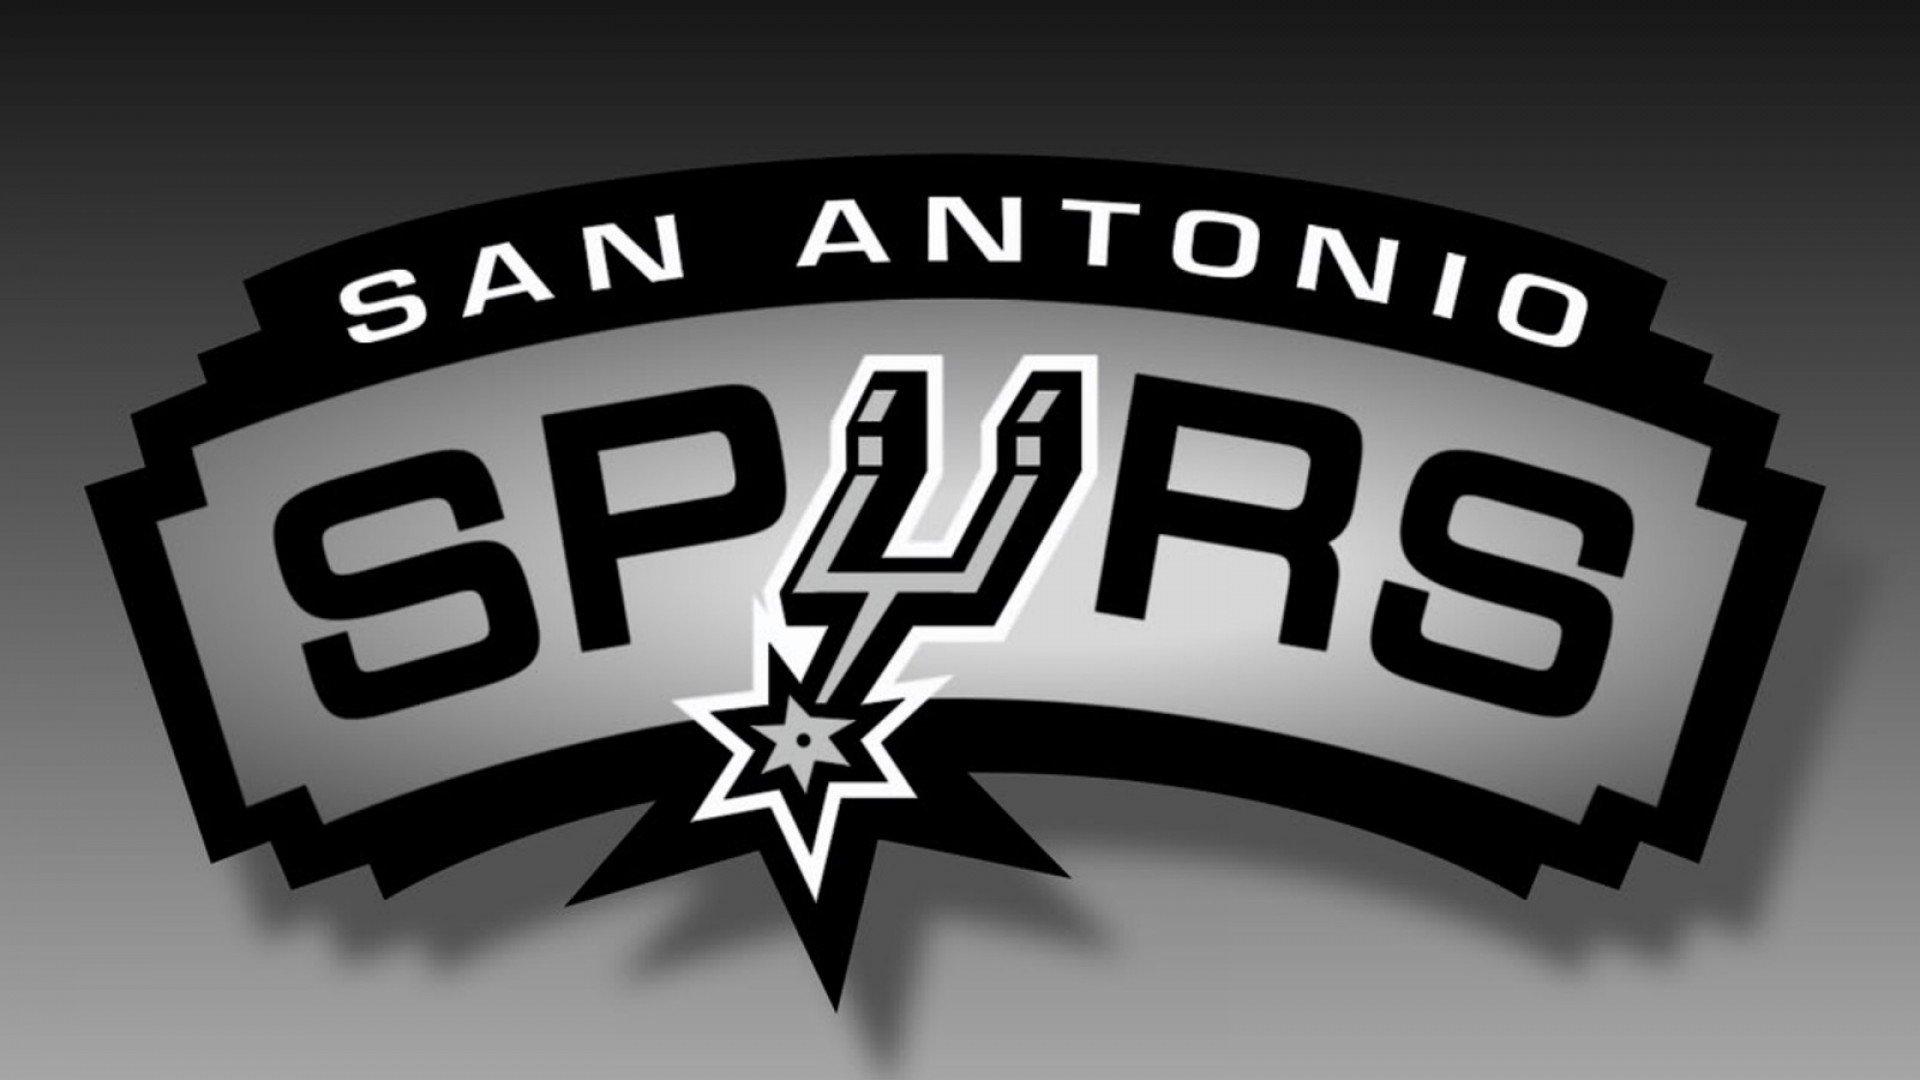 San Antonio Spurs screen wallpaper